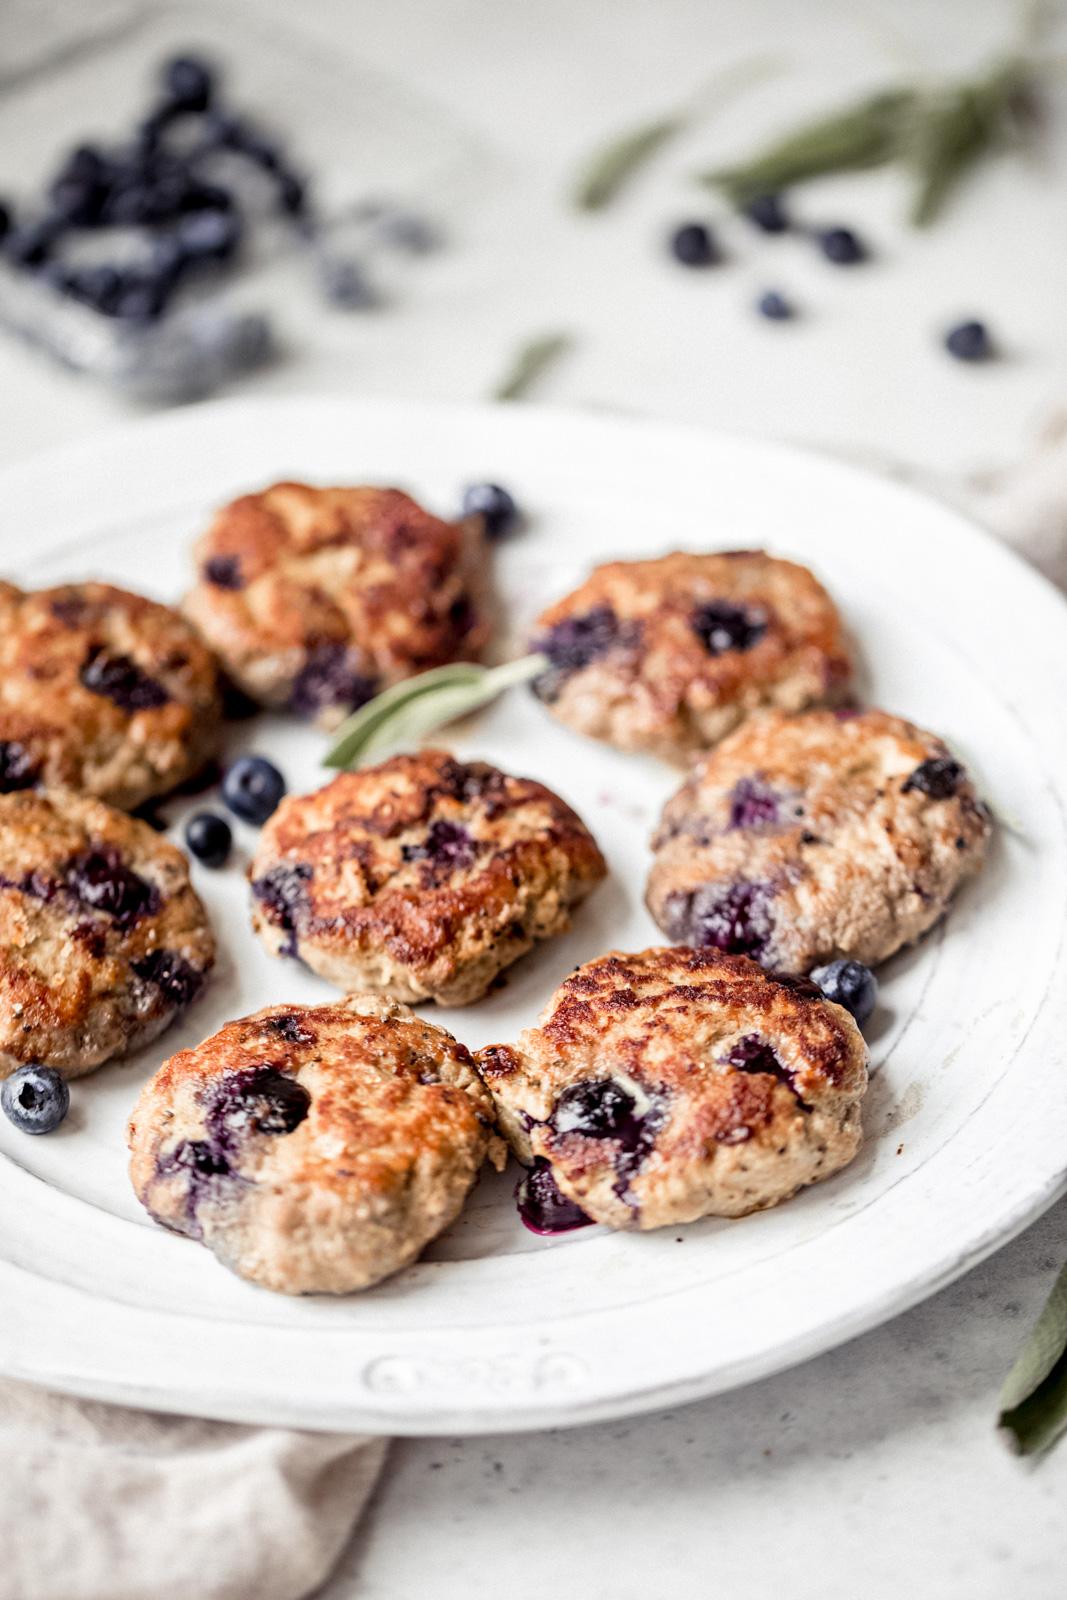 maple blueberry turkey sausage breakfast patties on a plate